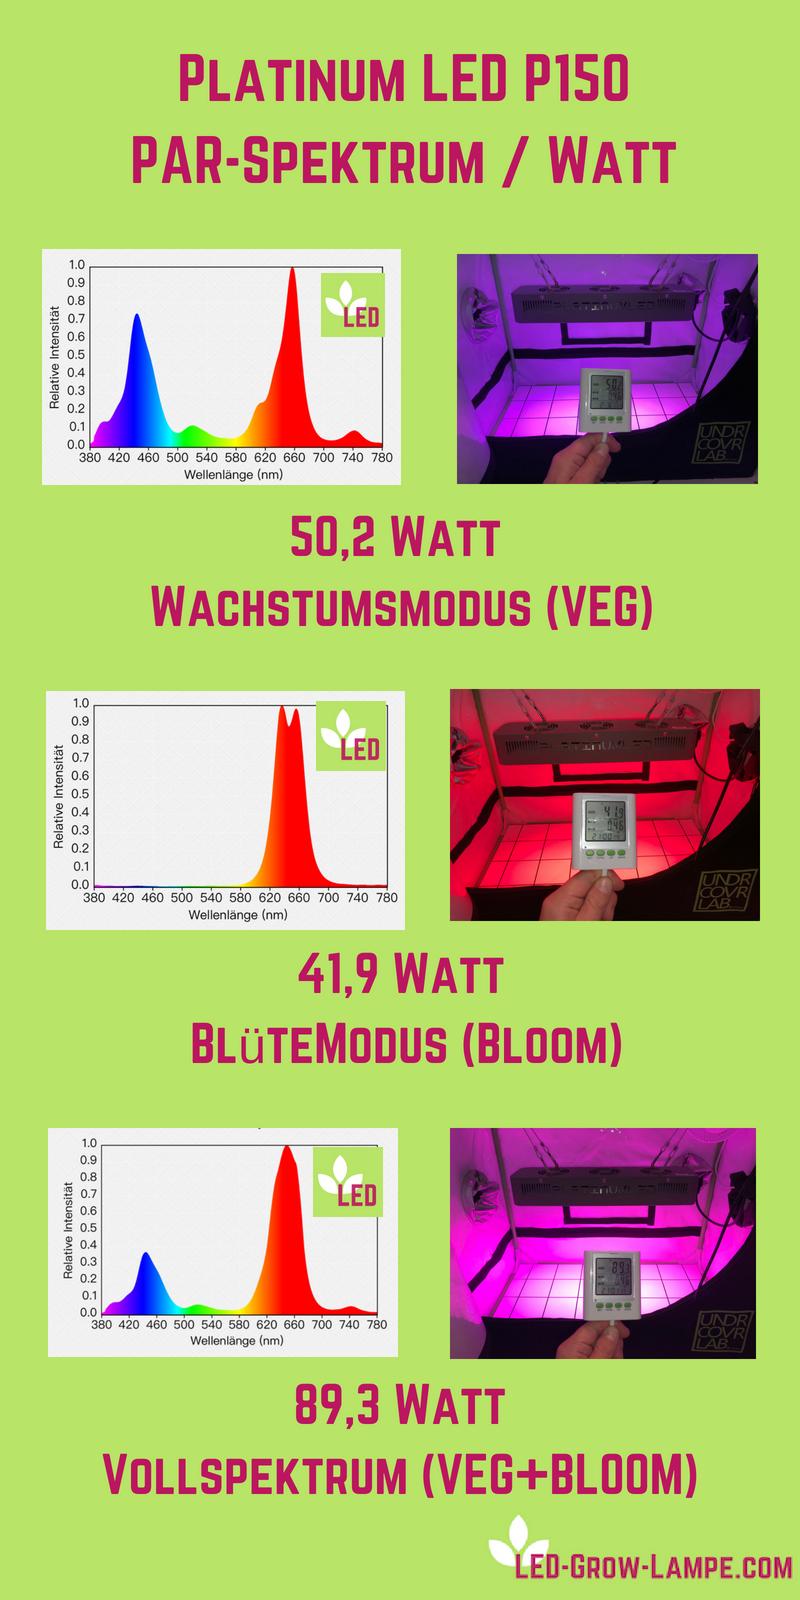 P150 Platinum LED Lichtspektrum/Watt